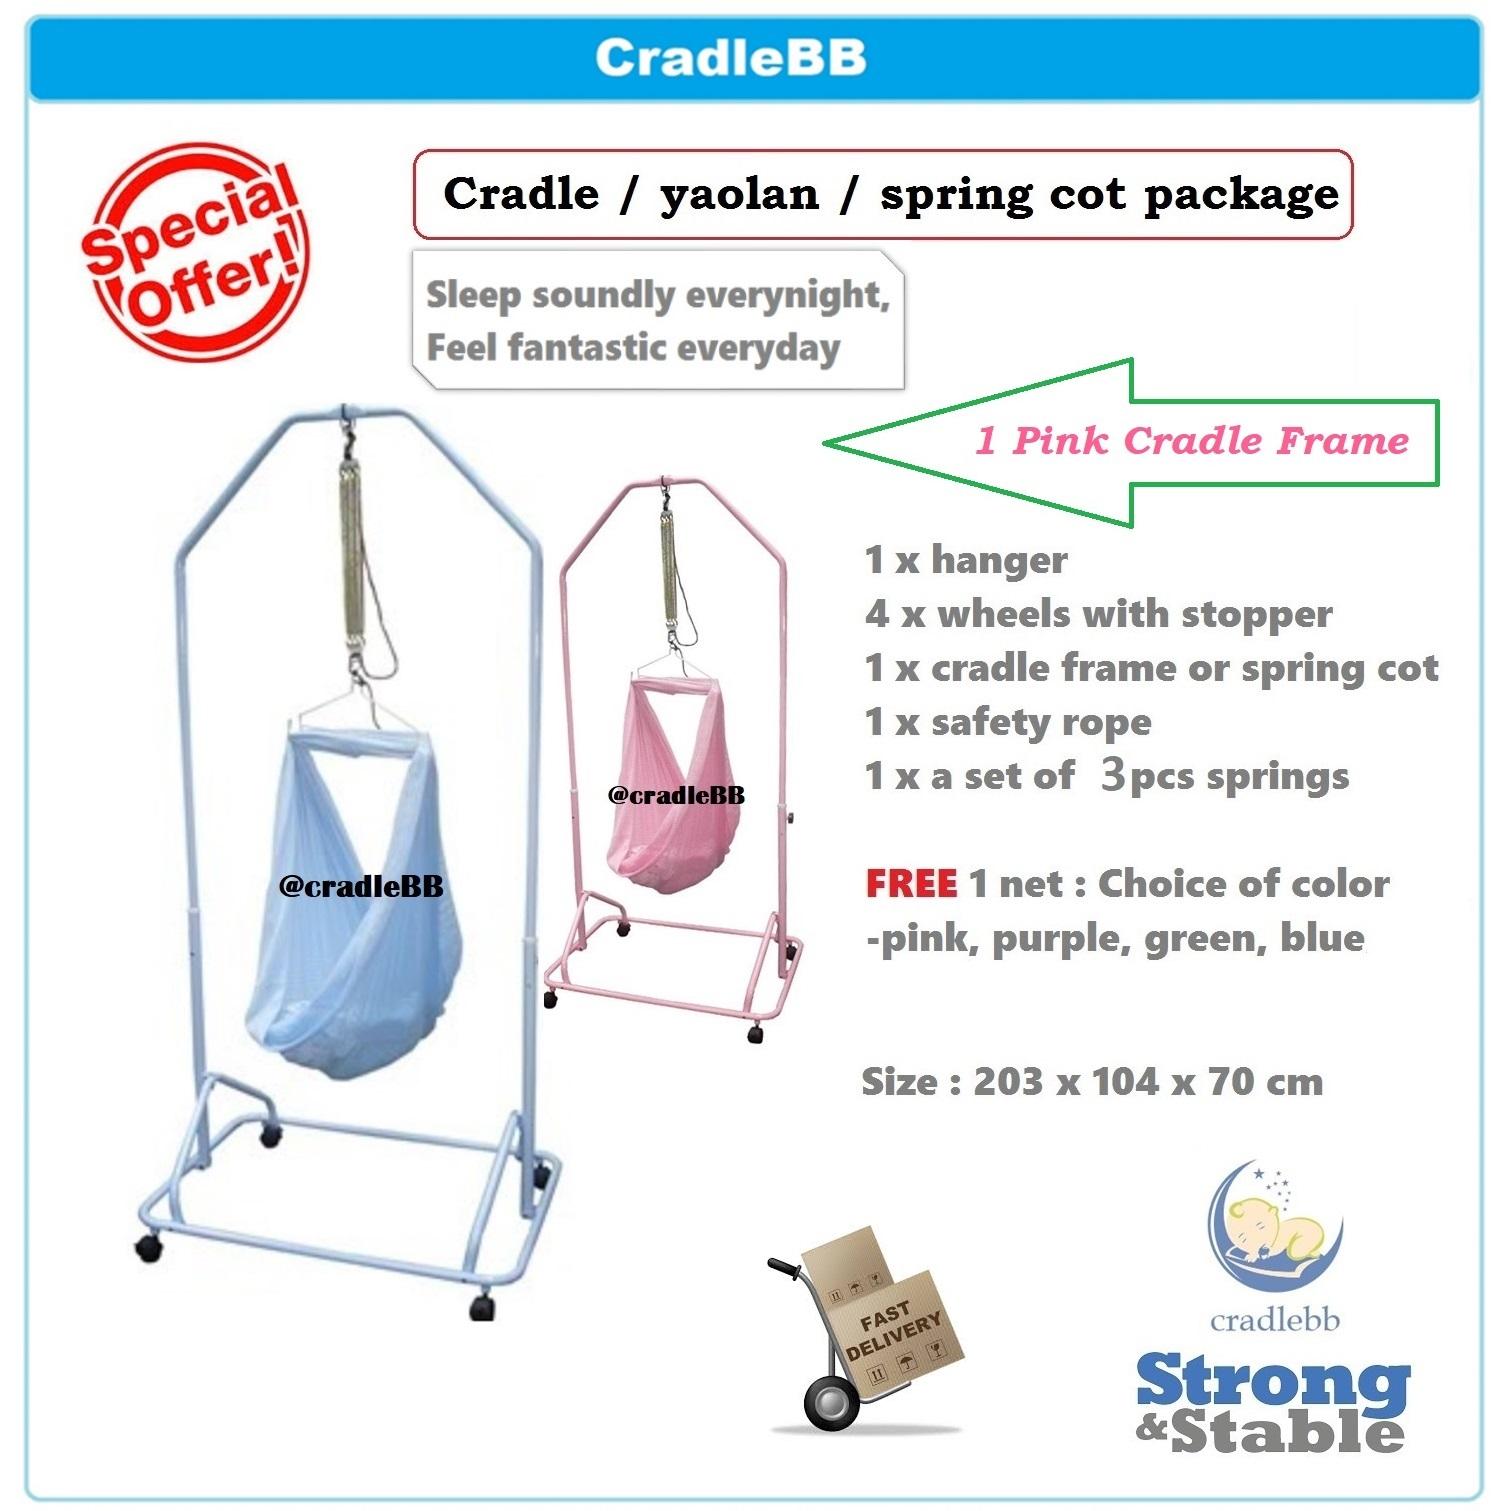 Baby Cradle / Spring Cot/ Hammock/ Yaolan + 3pcs Springs (free 1 Net).